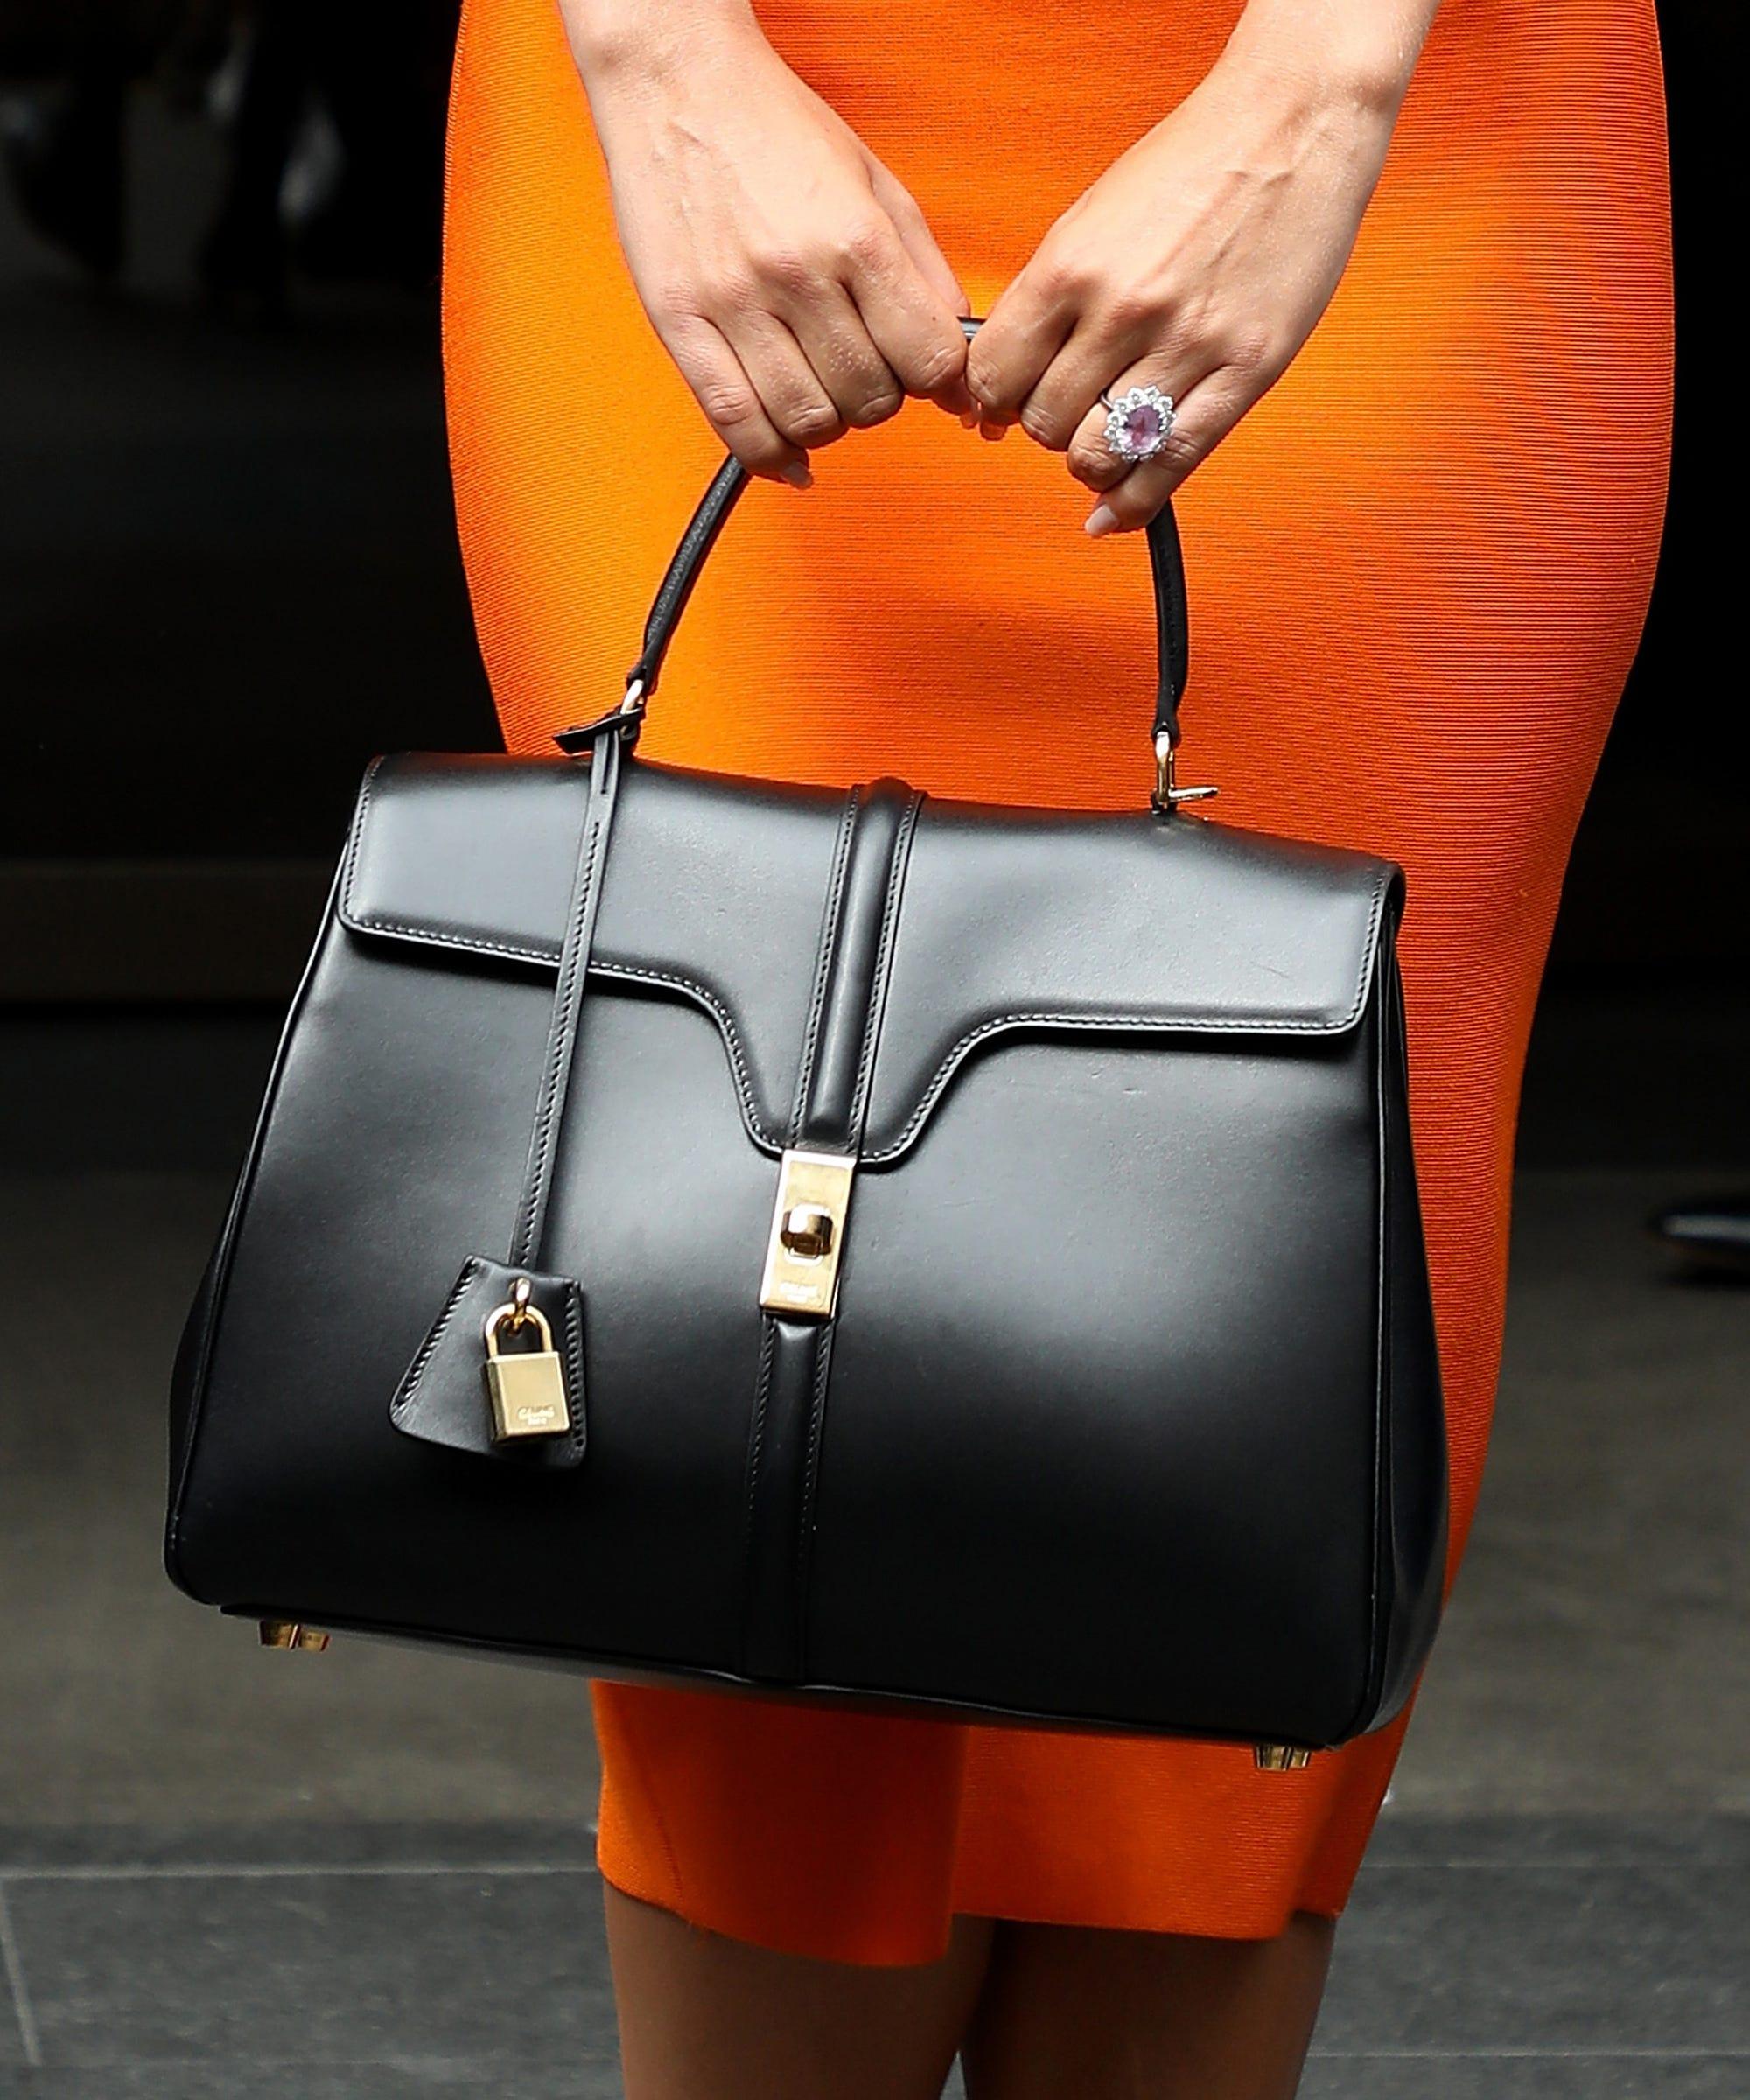 Lady Gaga Carries First Hedi Slimane Celine Bag 690d998fc4